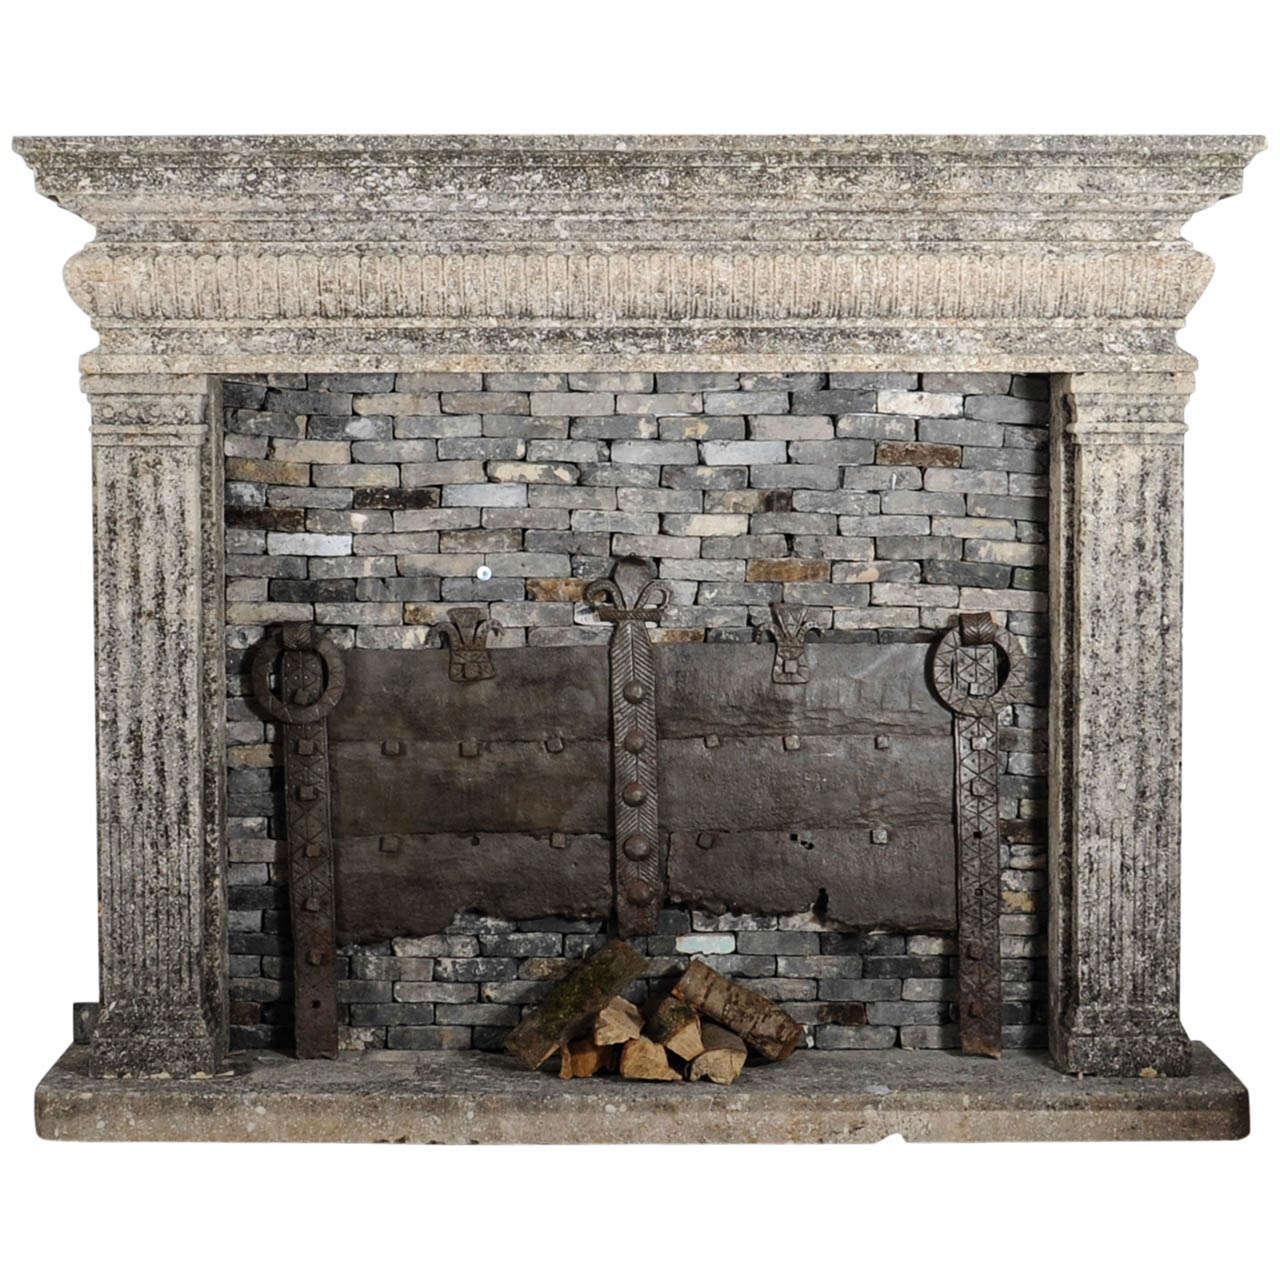 A limestone Italian Renaissance style fireplace and a monumental 16th century French wrought iron fireback 1